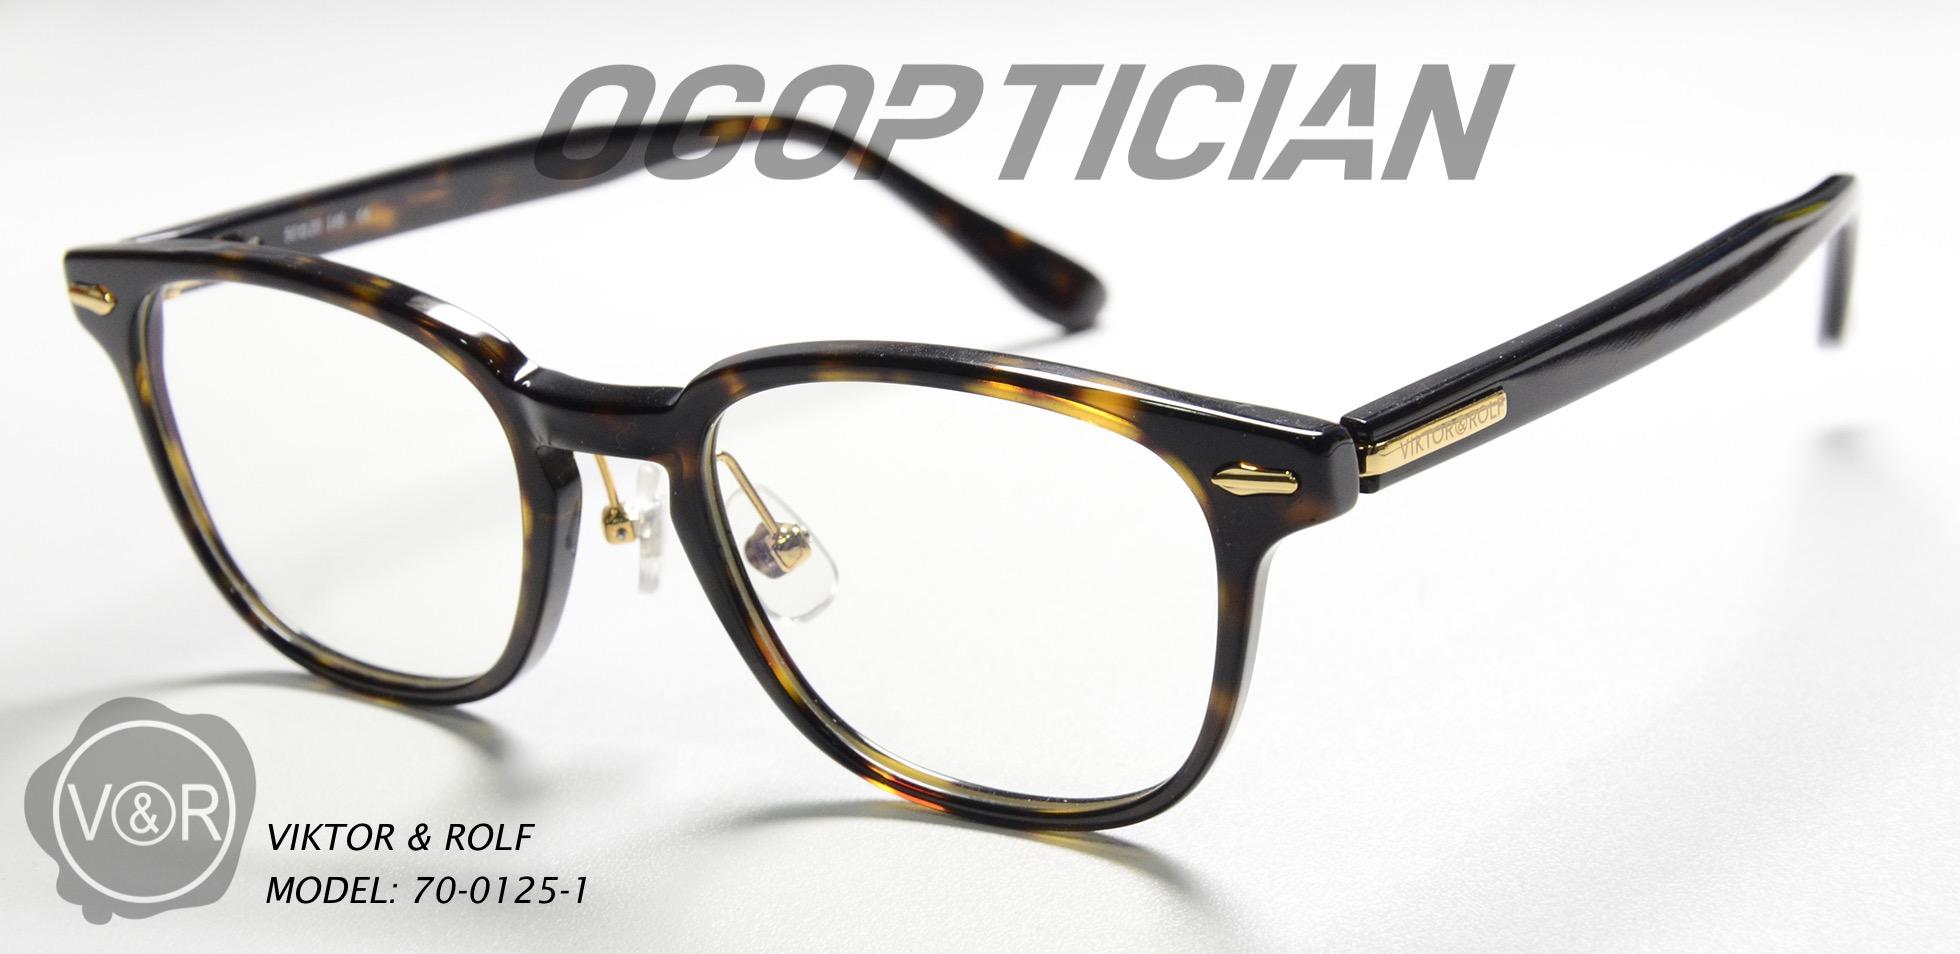 VIKTORANDROLF 70-0125-1